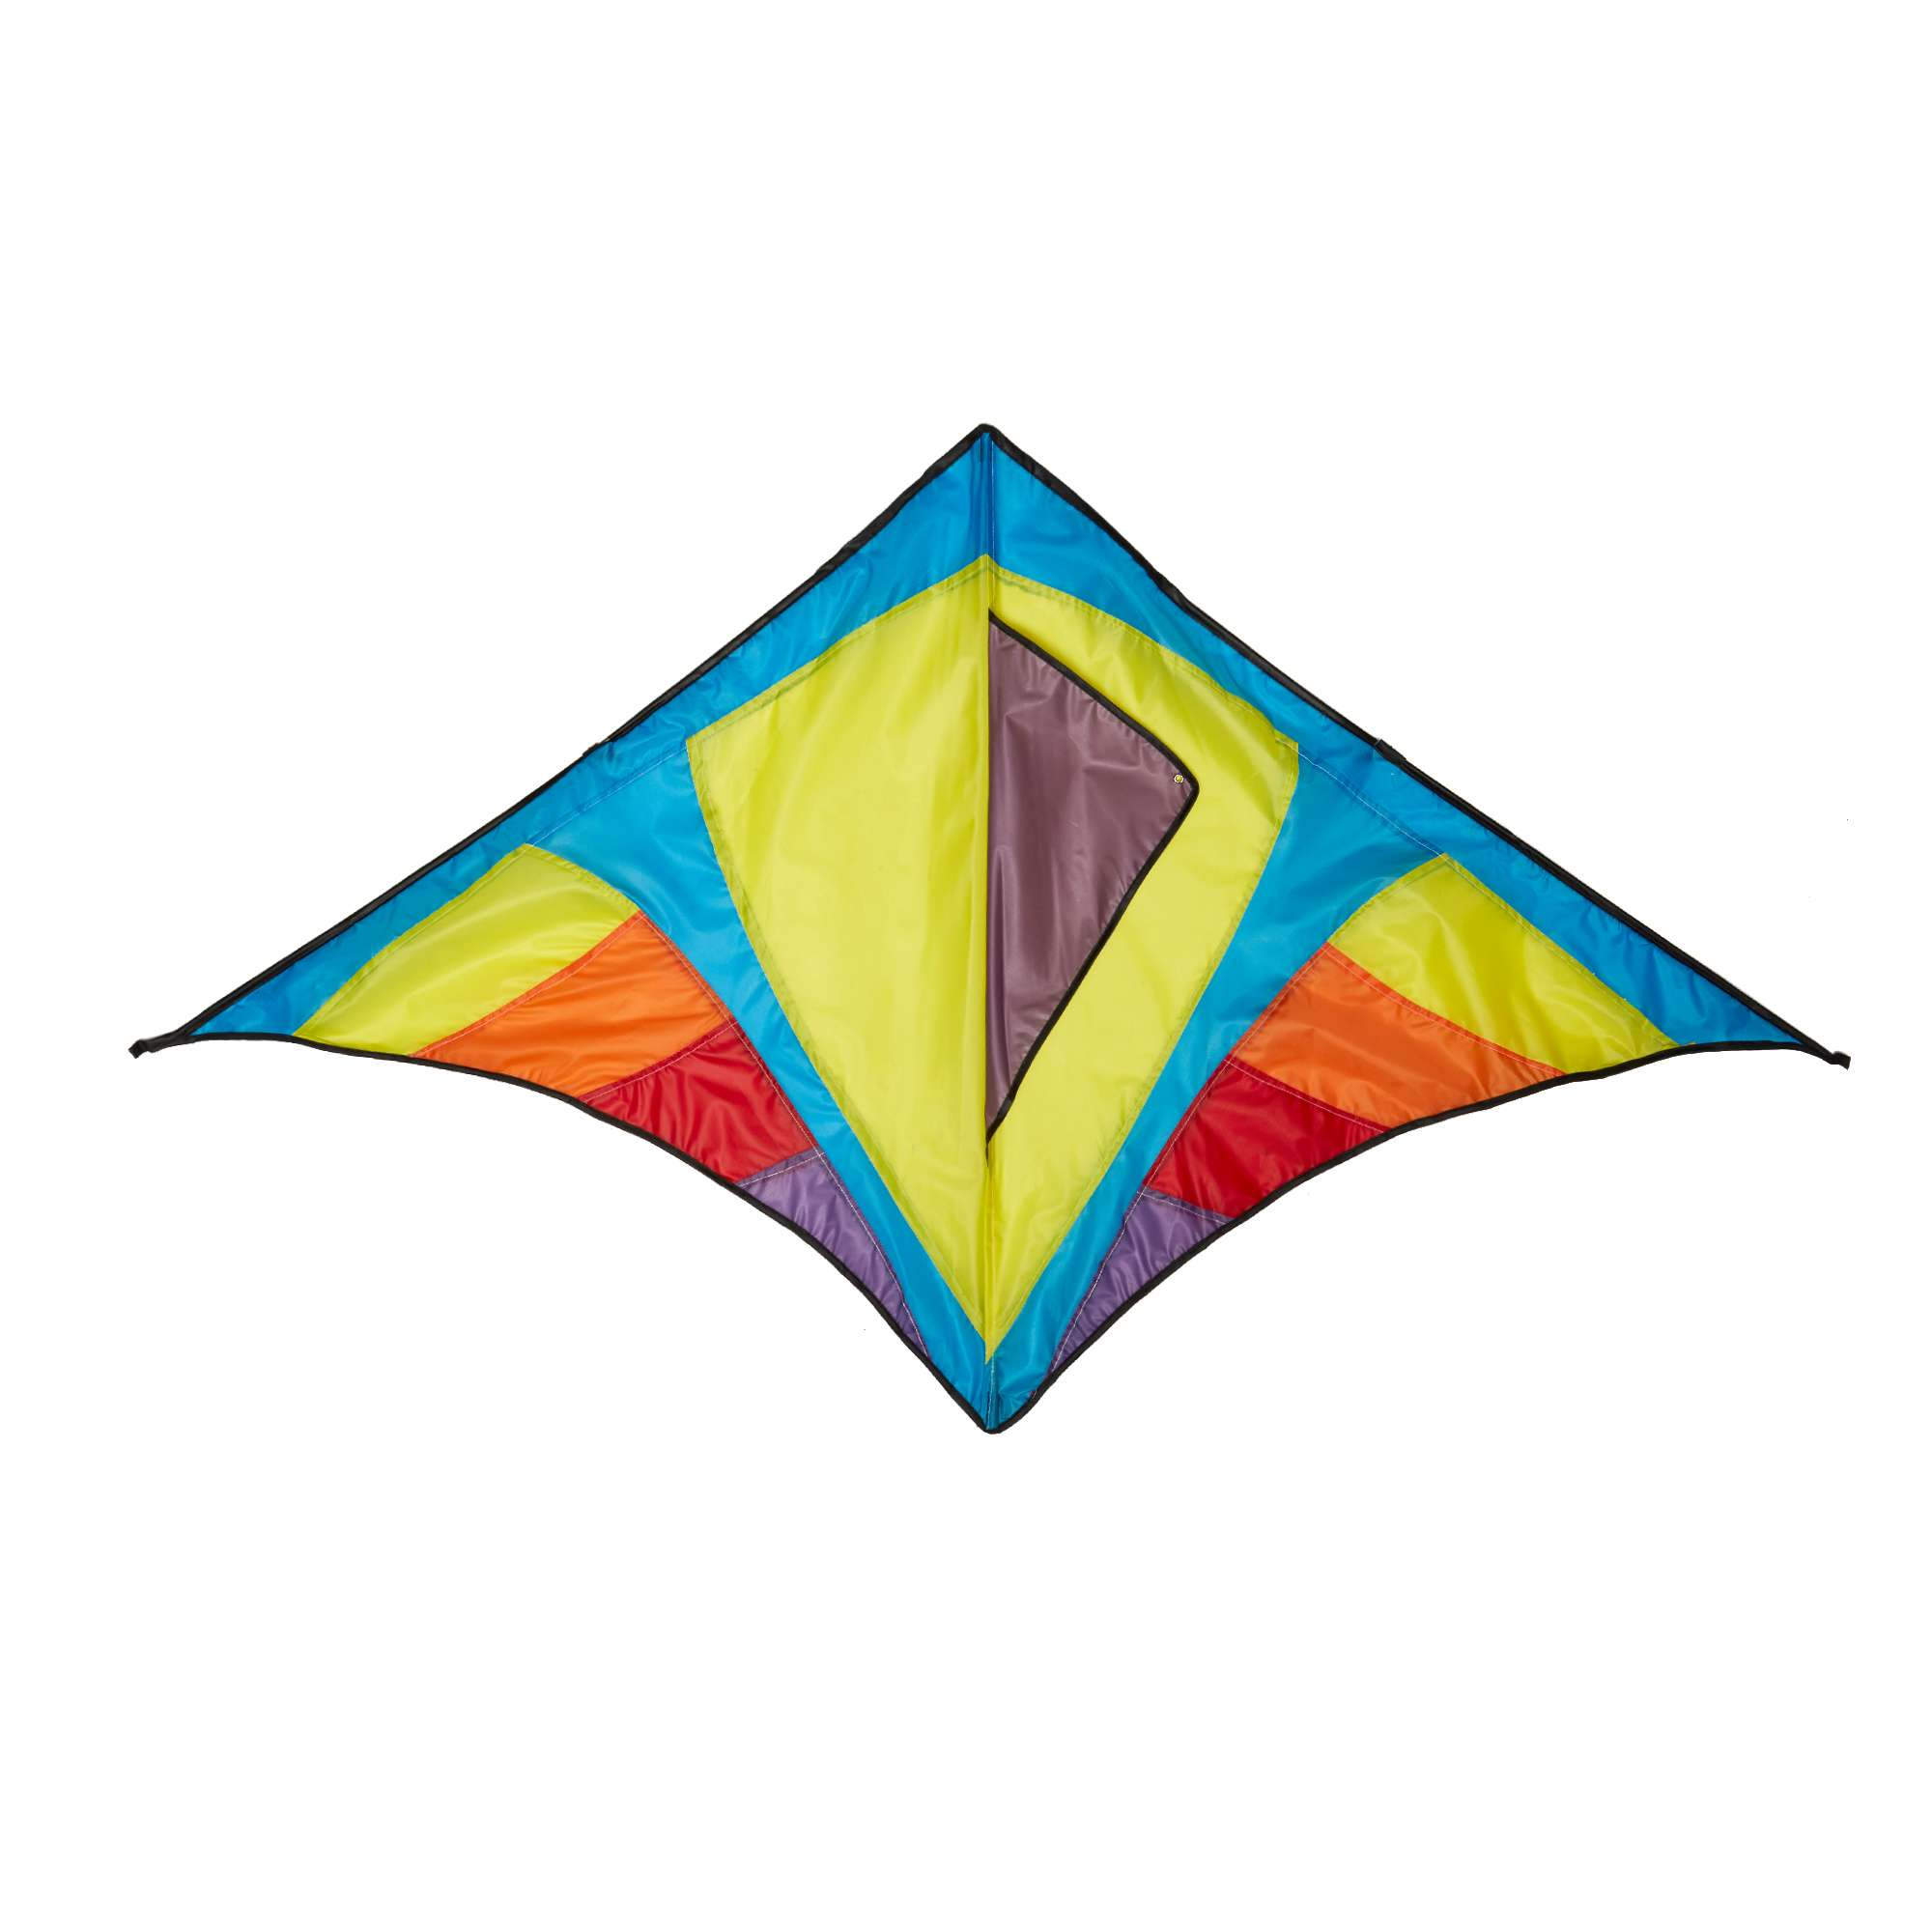 BOYZ TOYS Stunt Kite